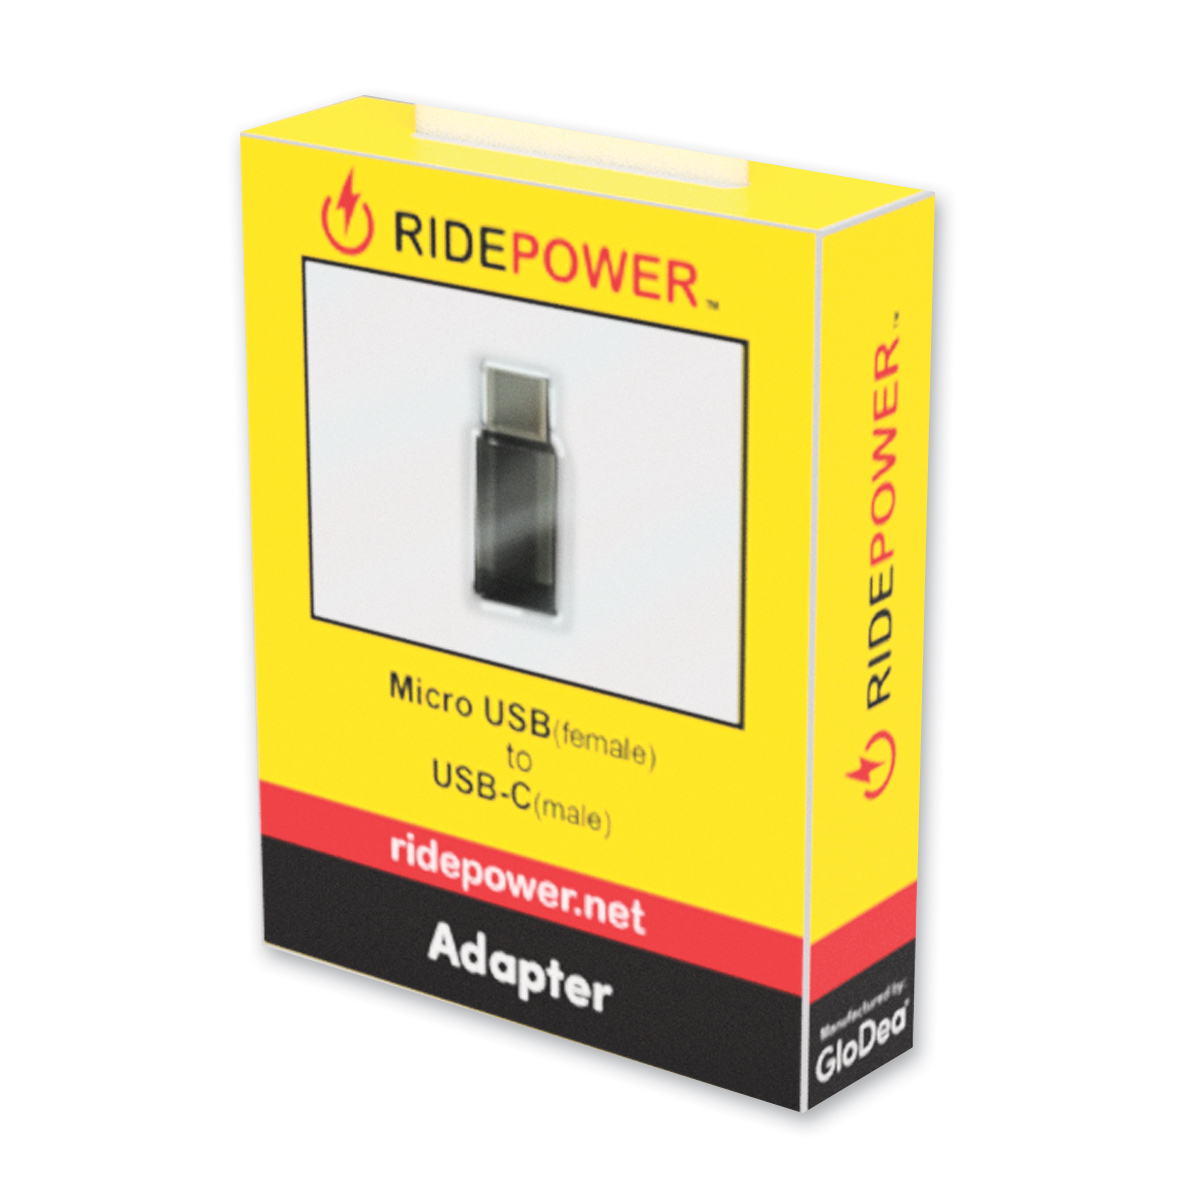 RidePower Micro USB-USB-C Adapter